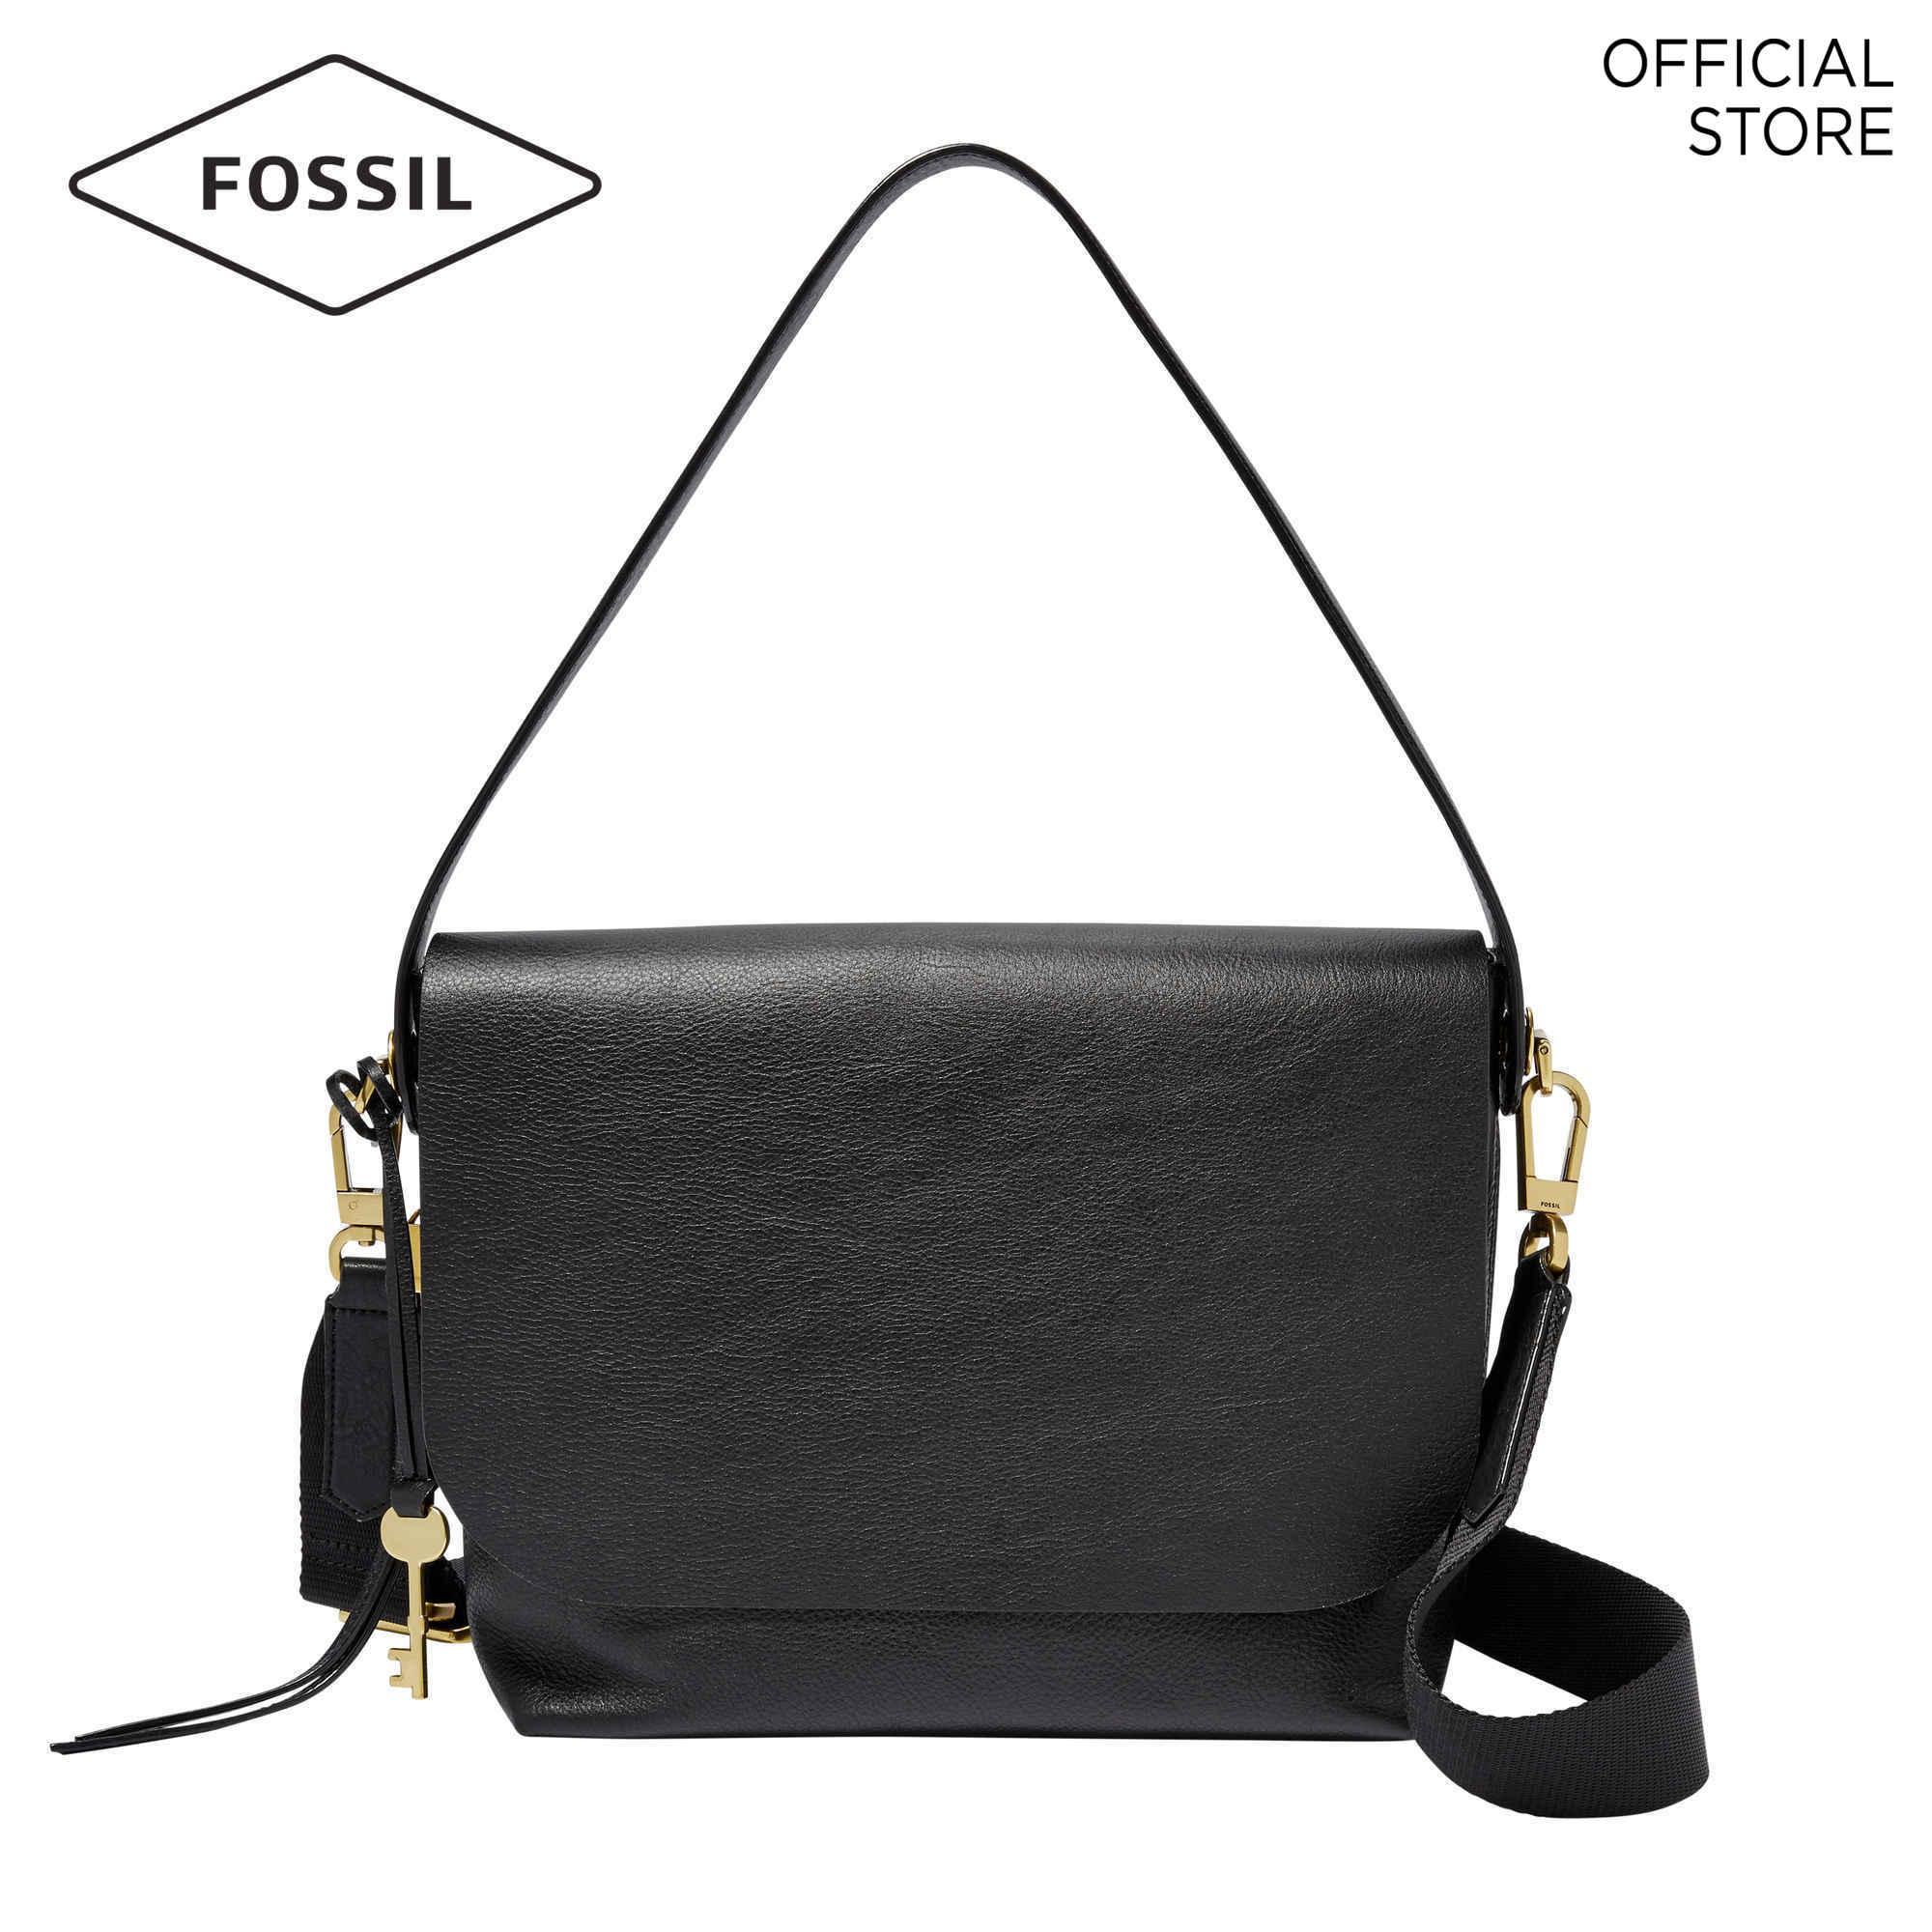 b7faea6ff Latest Fossil Cross Body & Shoulder Bags Products | Enjoy Huge ...